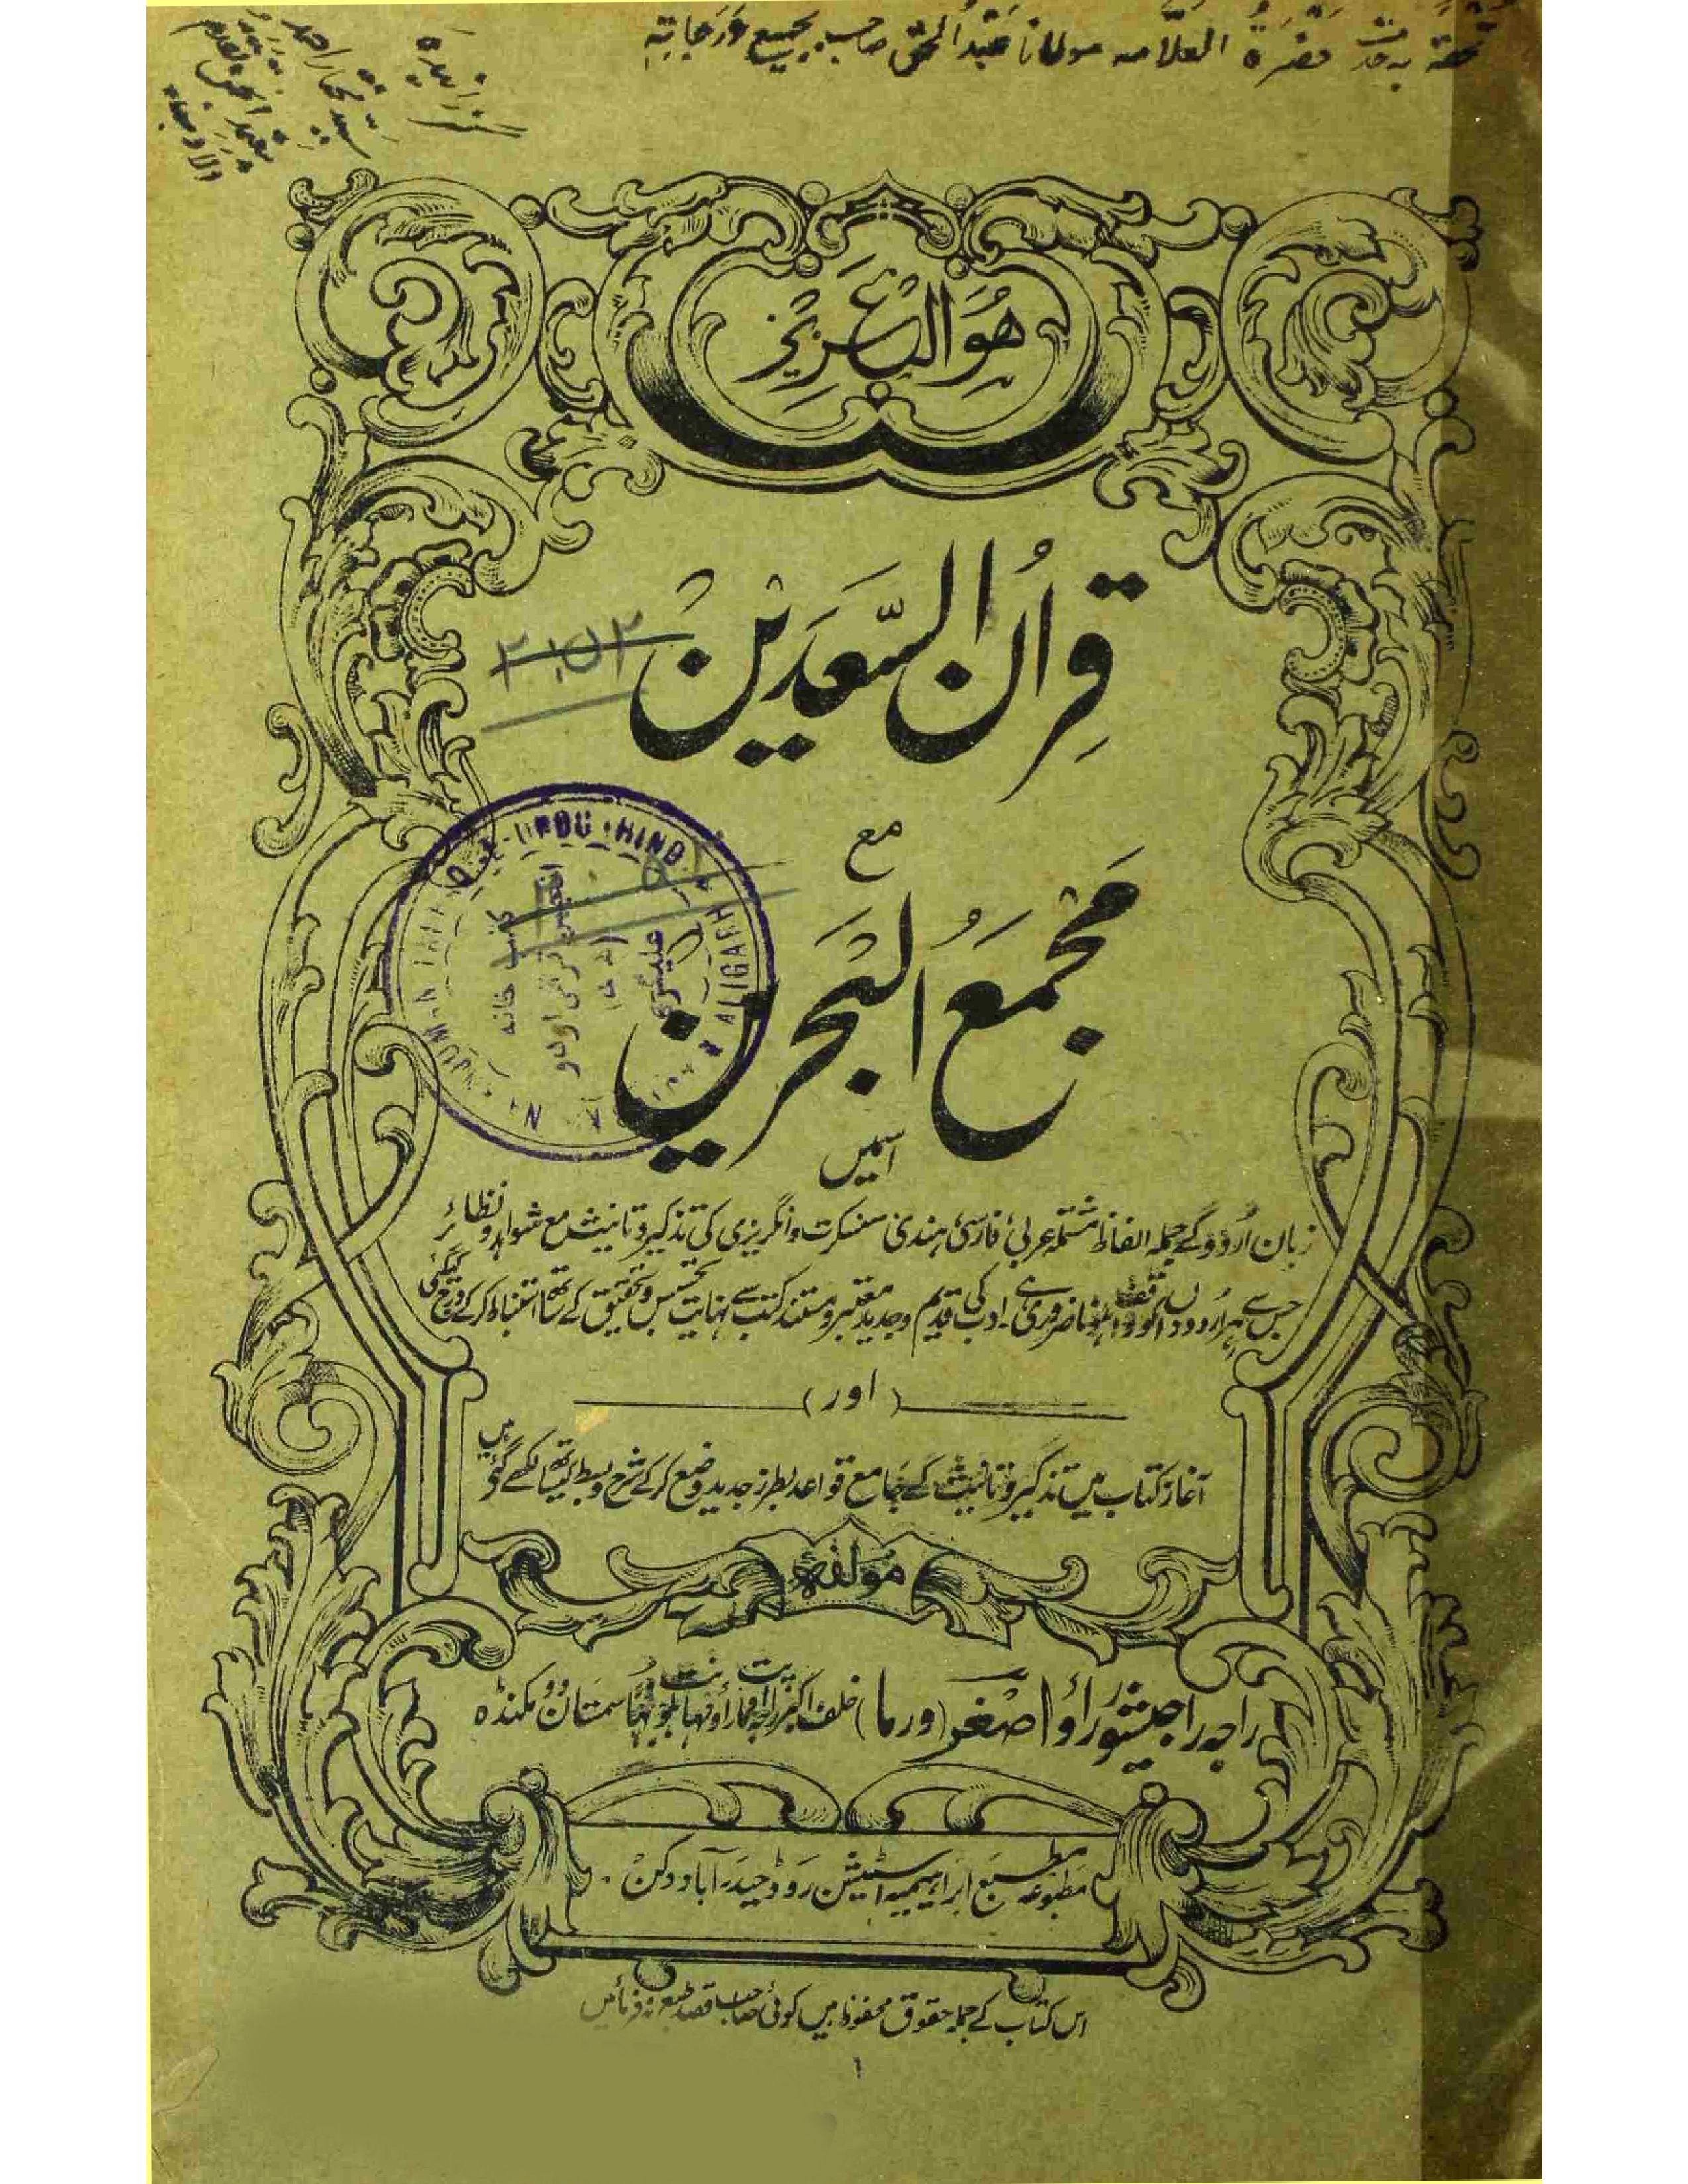 Qiranus Sadain Ma'a Majmaul Bahrain